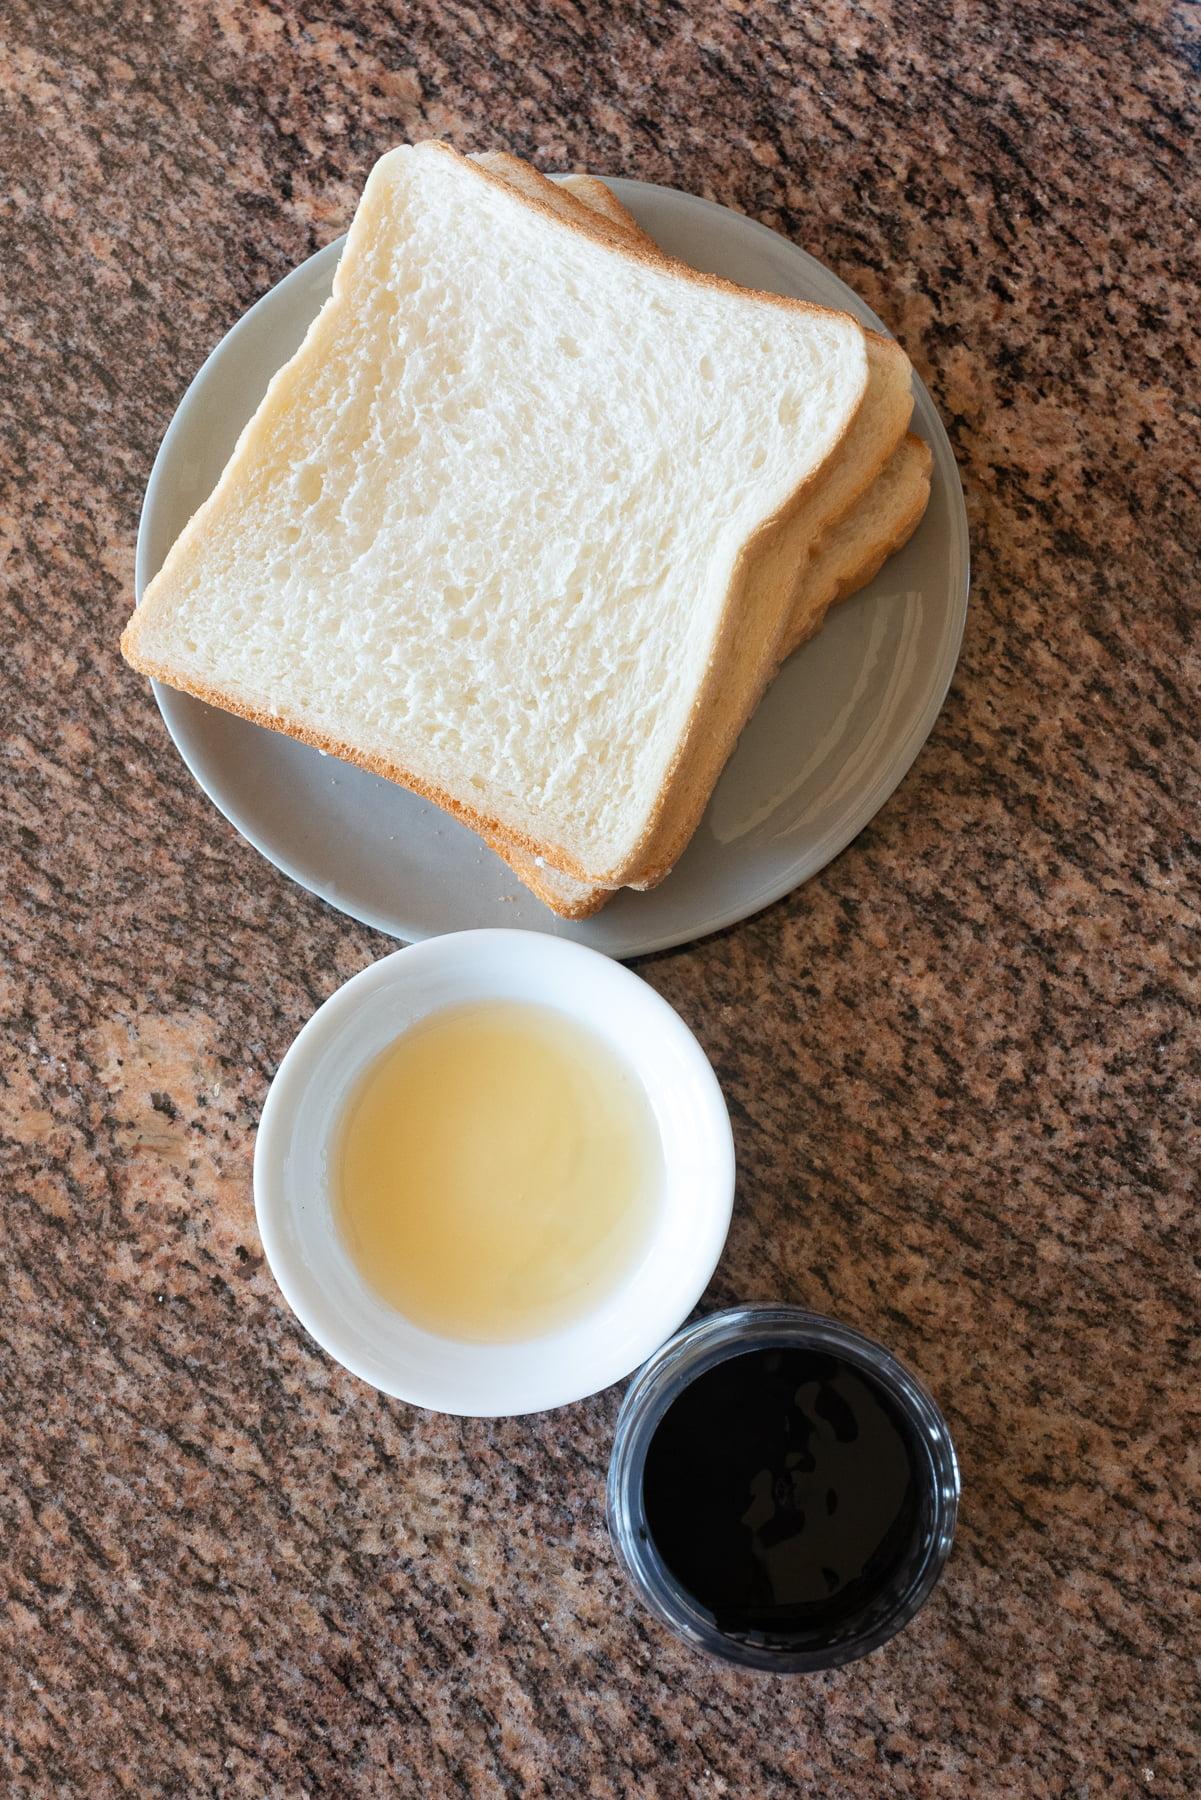 Ingredients for Black Sesame Toast (soft white bread, honey, and black sesame paste).